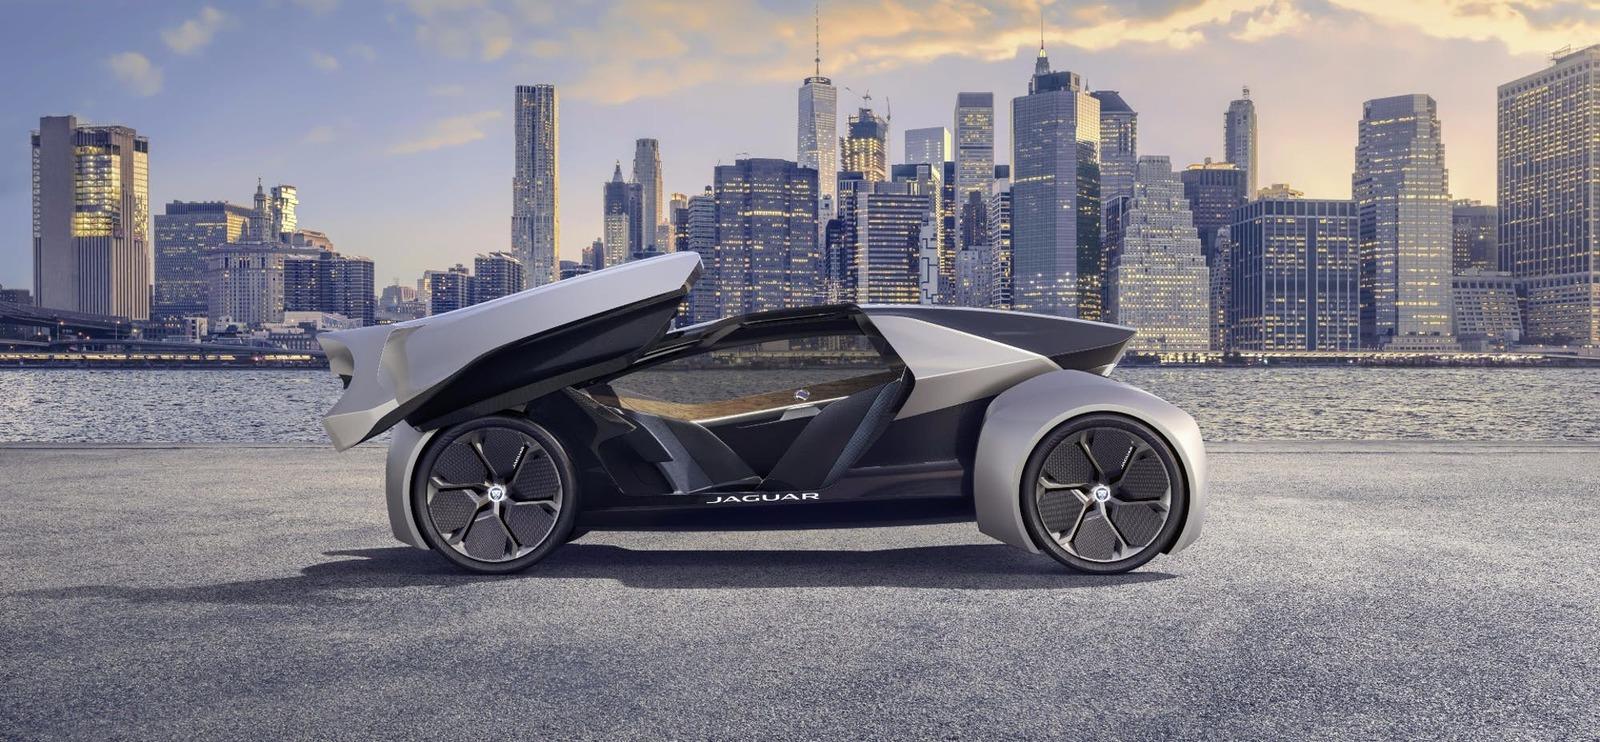 Jaguar Future Type, Concept Source: Media.jaguar.com